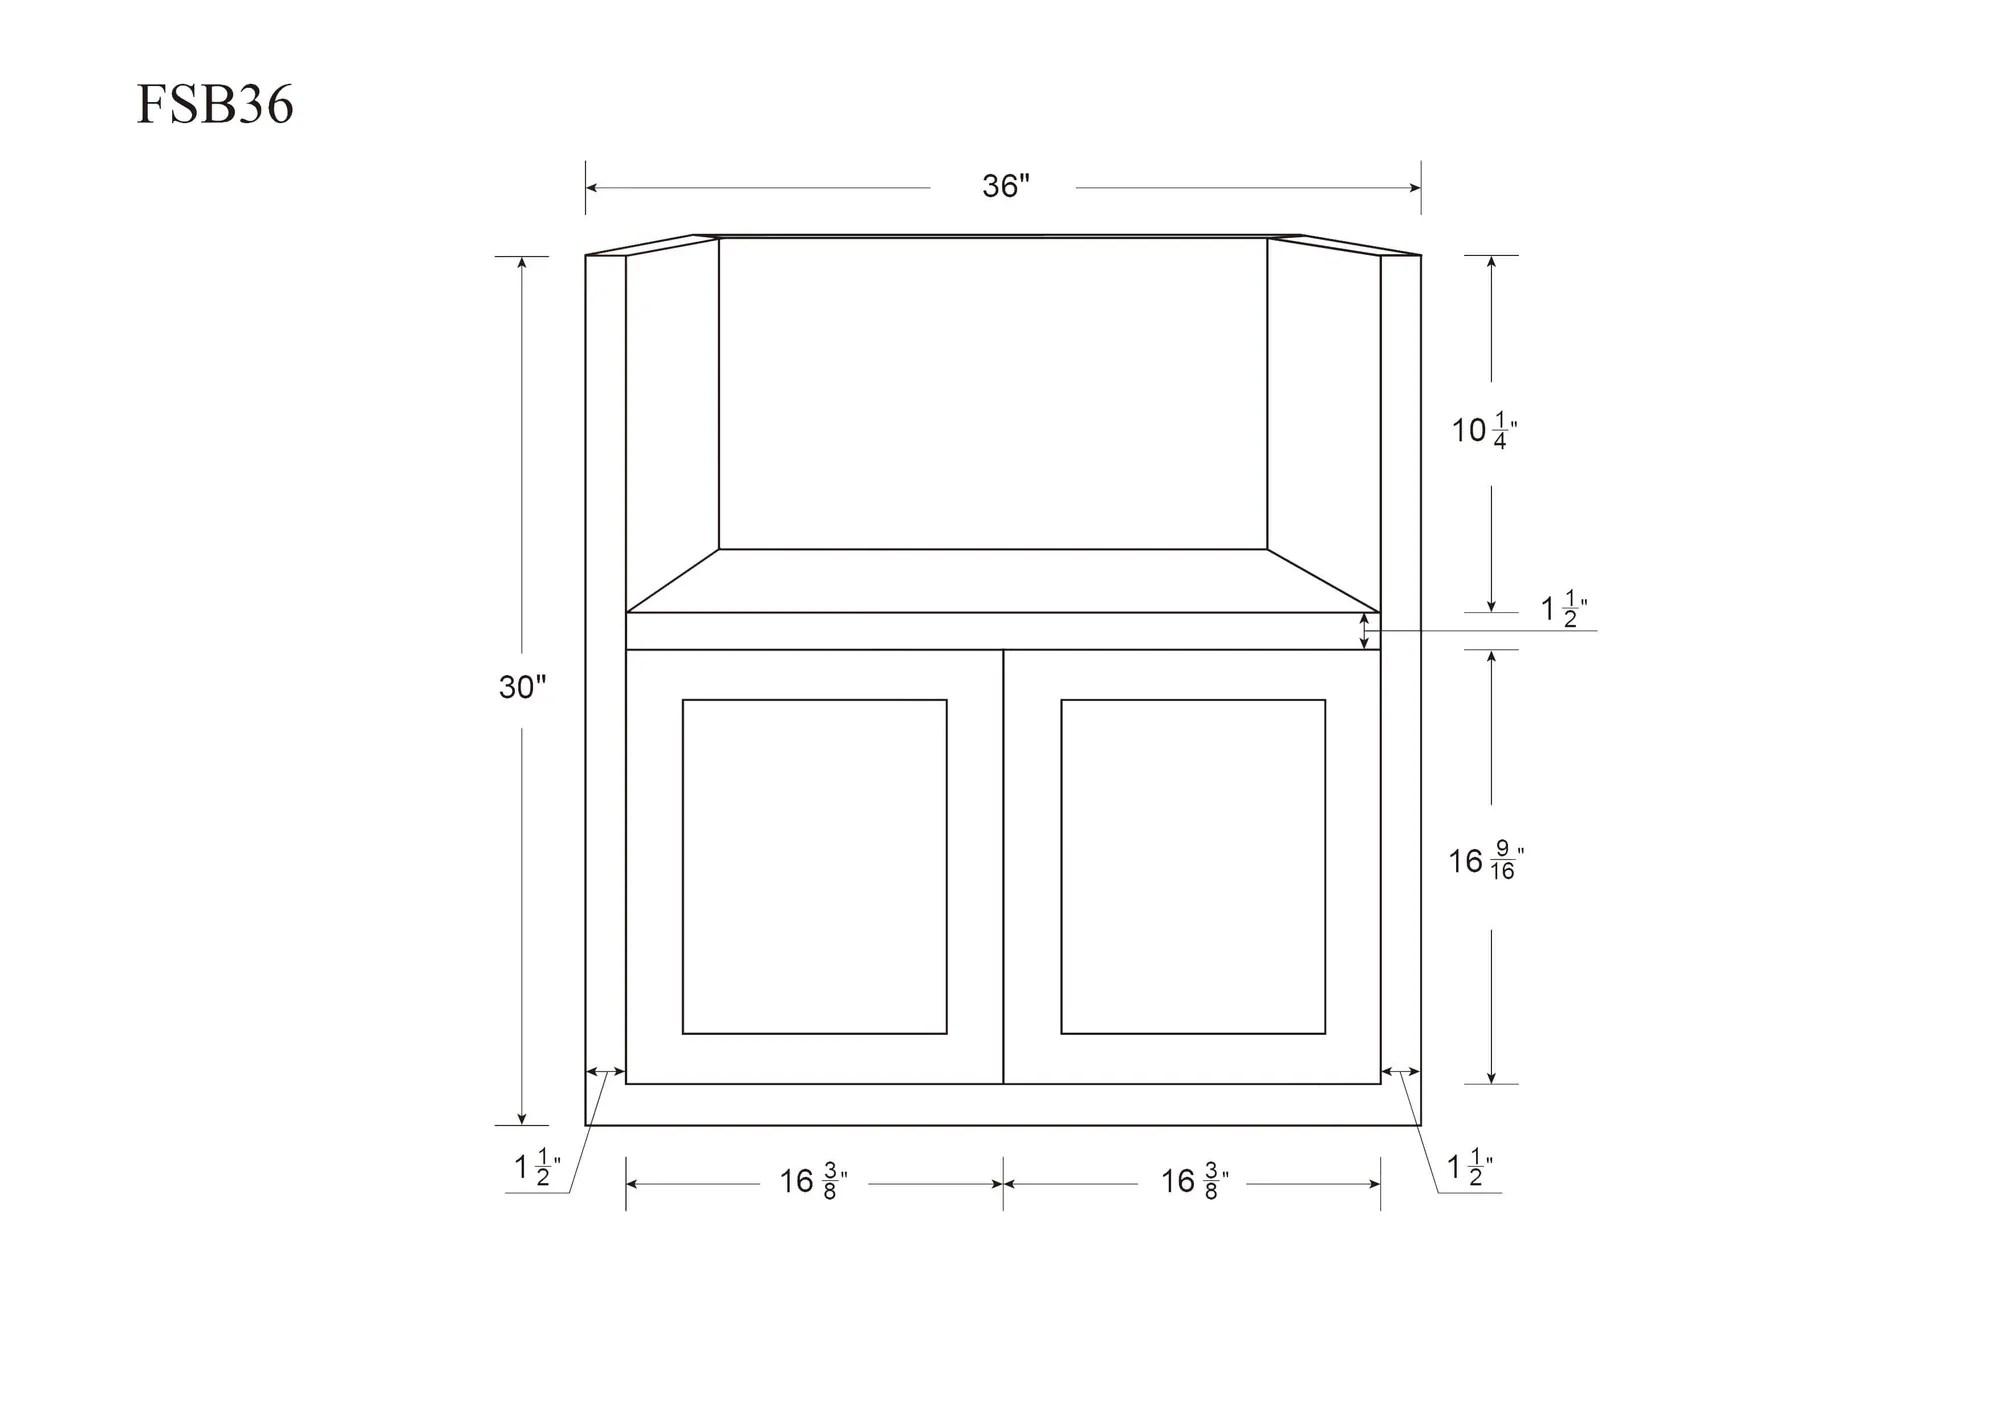 farm sink base vintage white inset raised panel cabinets 33 or 36